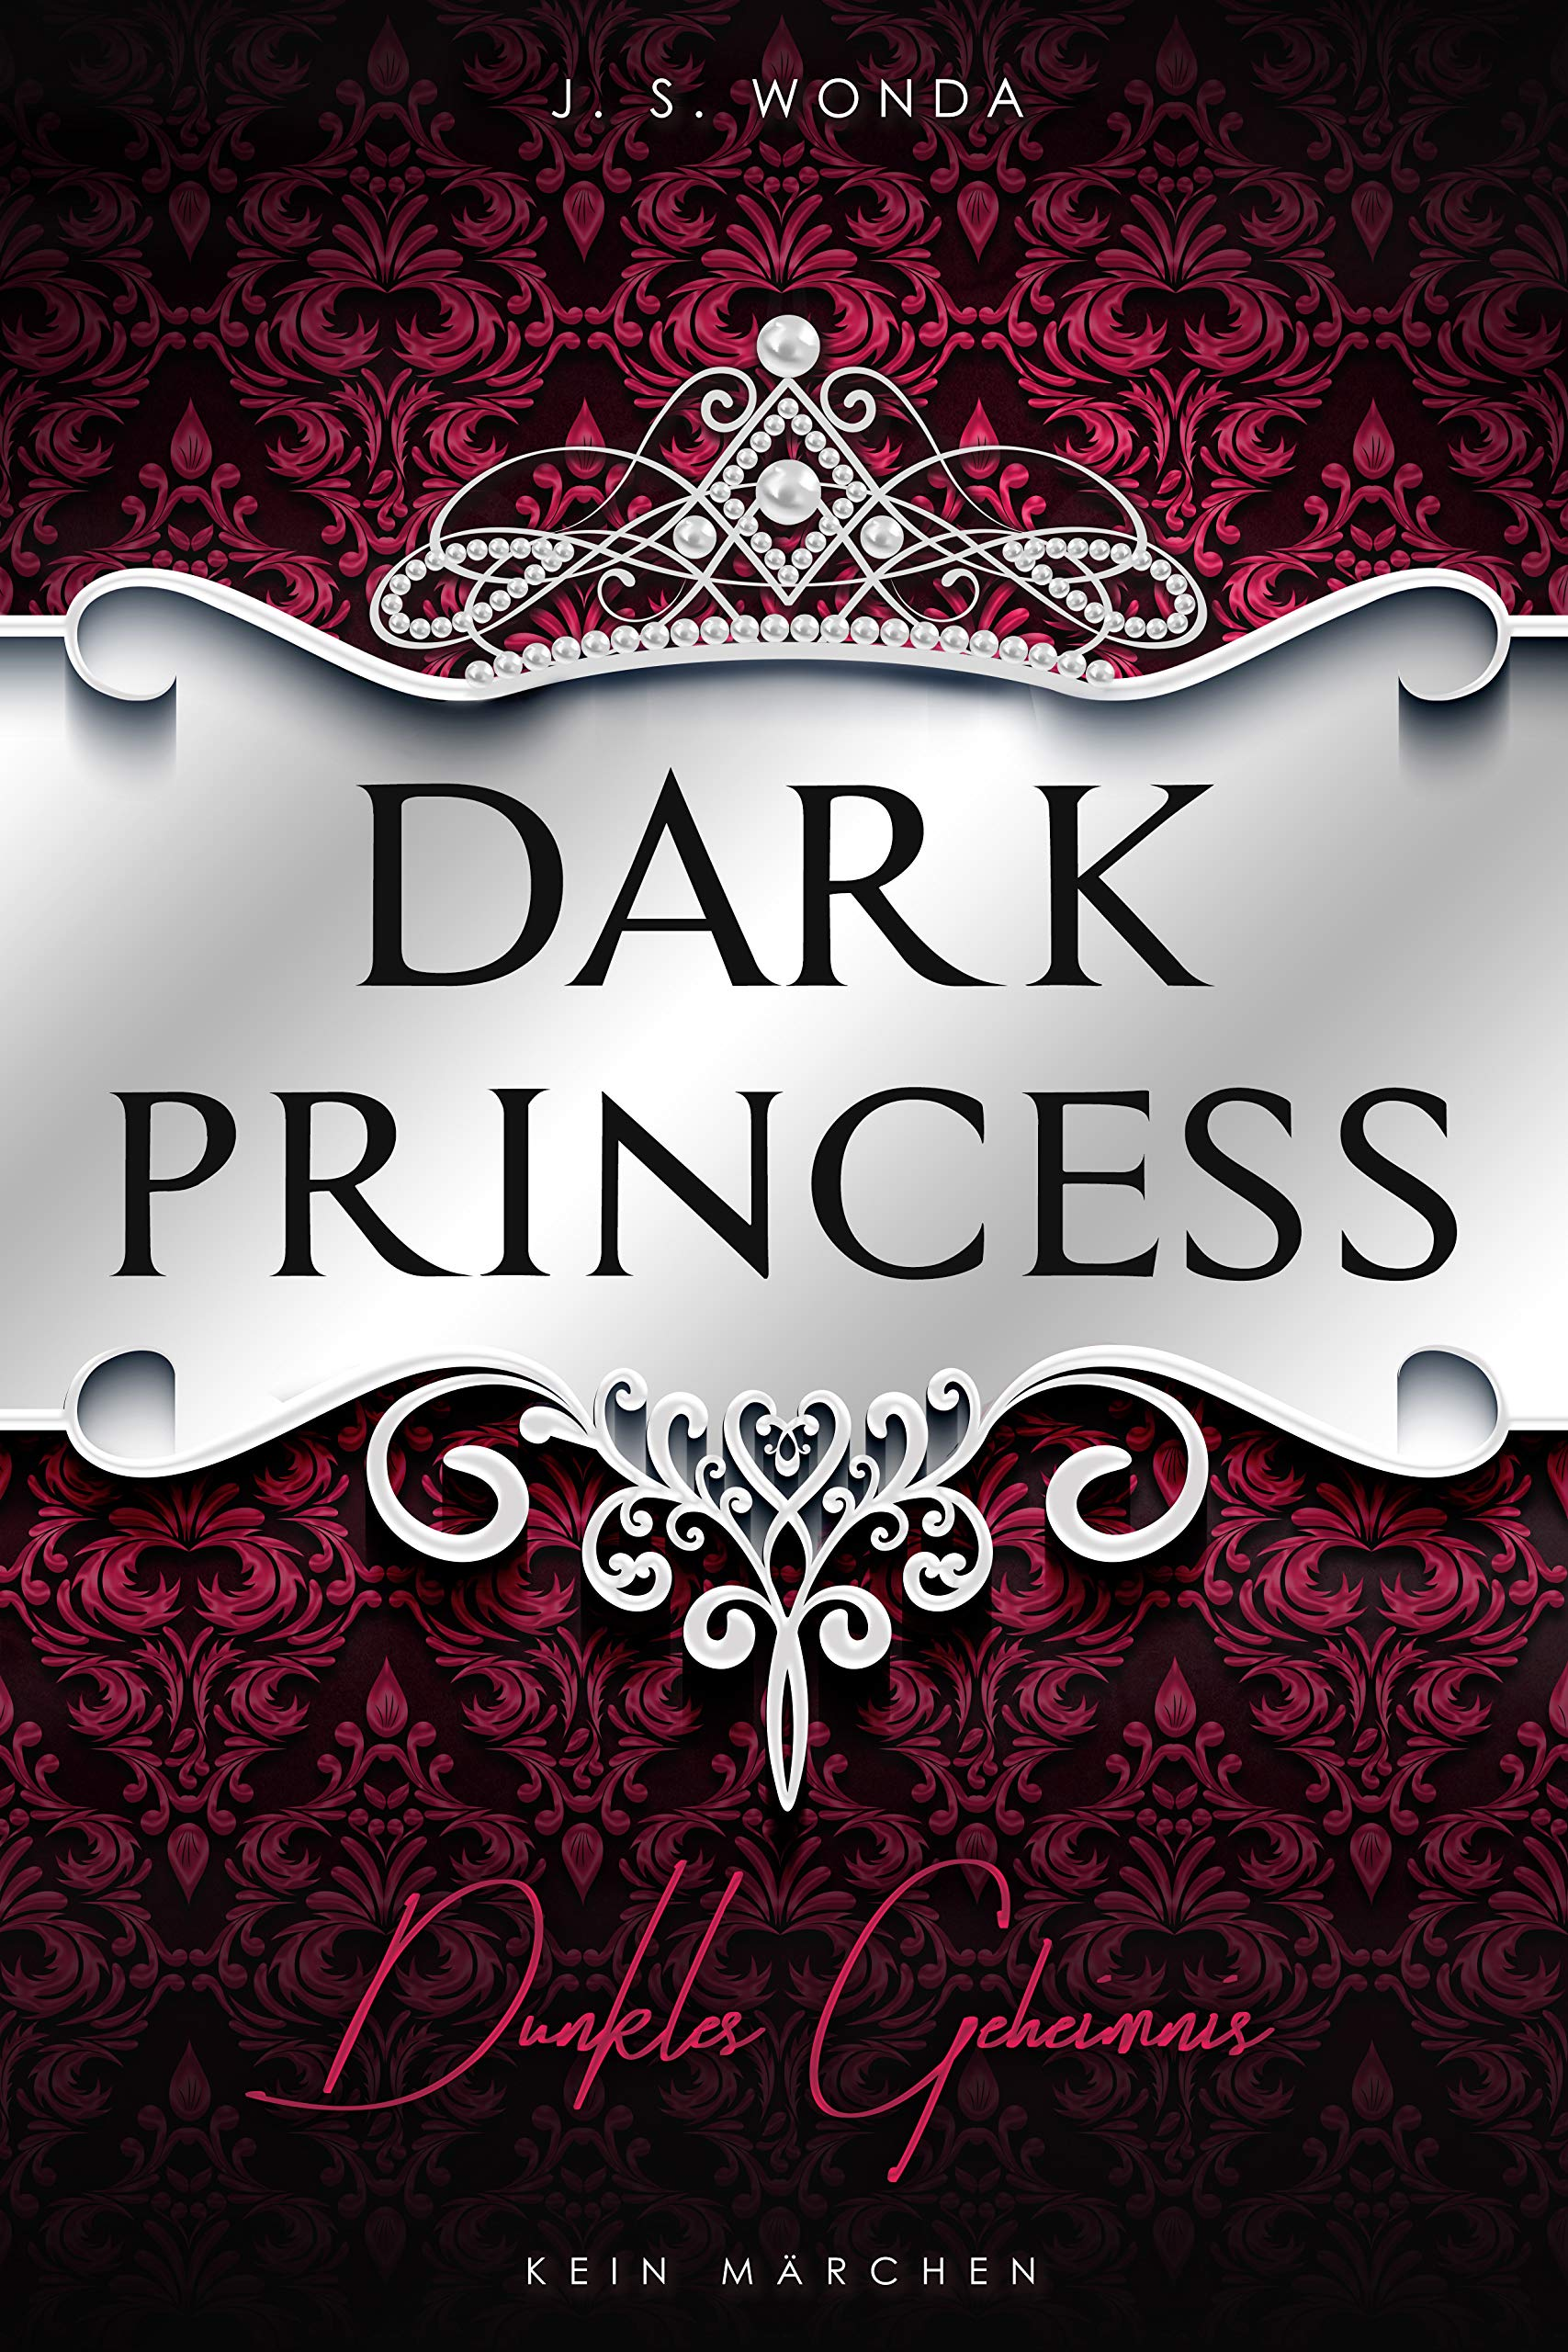 Dark Princess: Dunkles Geheimnis (Dark Prince - Band 5) Taschenbuch – 31. August 2018 J. S. Wonda Nova MD (Nova MD) 3961115478 FICTION / Erotica / General